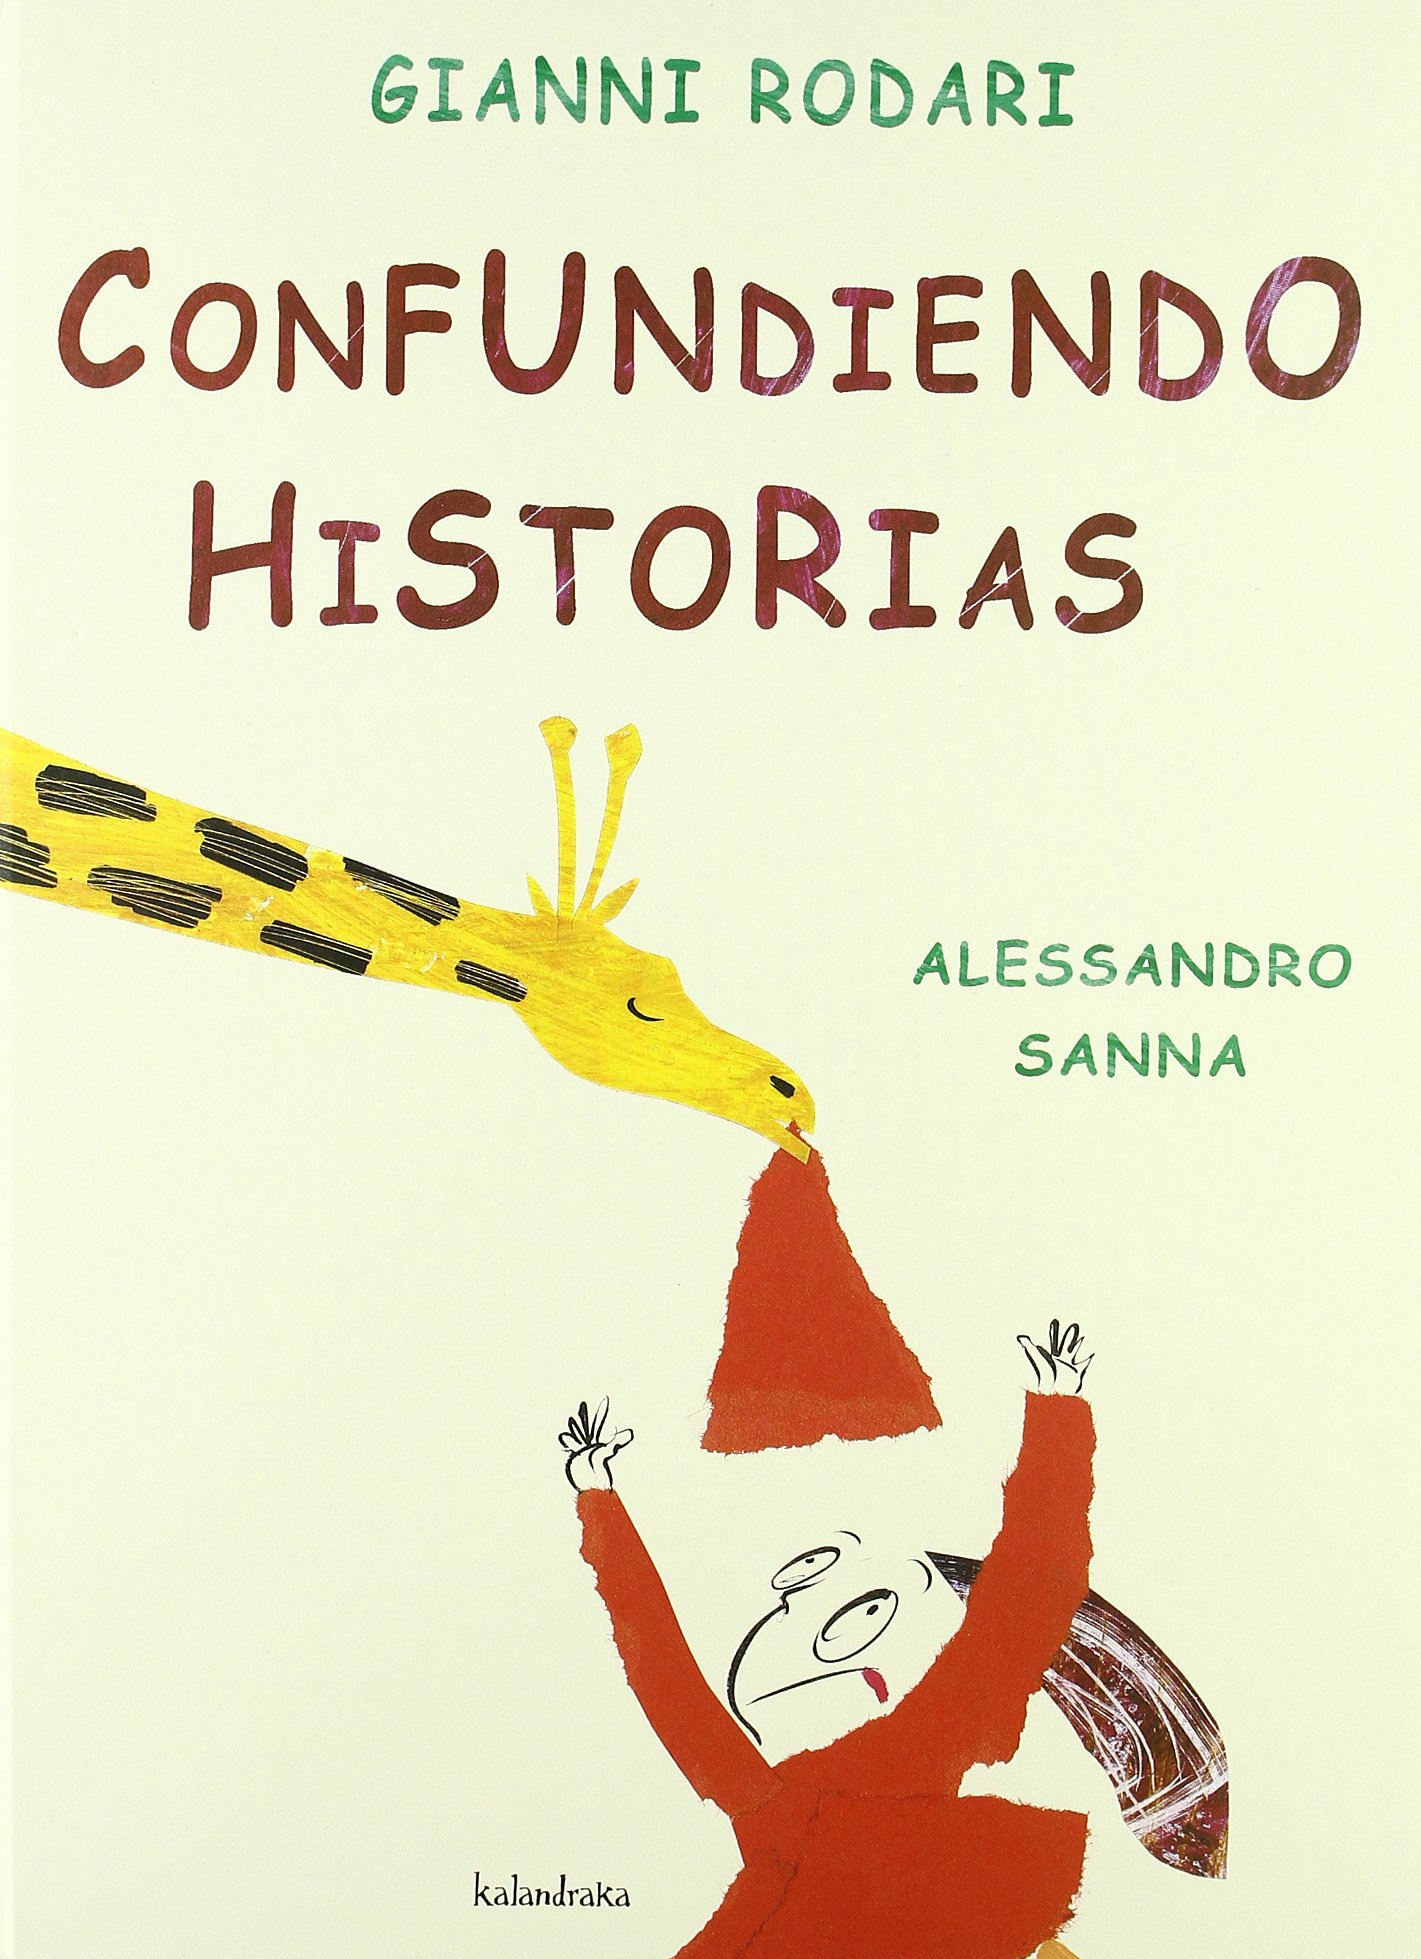 Confundiendo historias (libros para soñar): Amazon.es: Rodari, Gianni,  Sanna, Alessandro: Libros